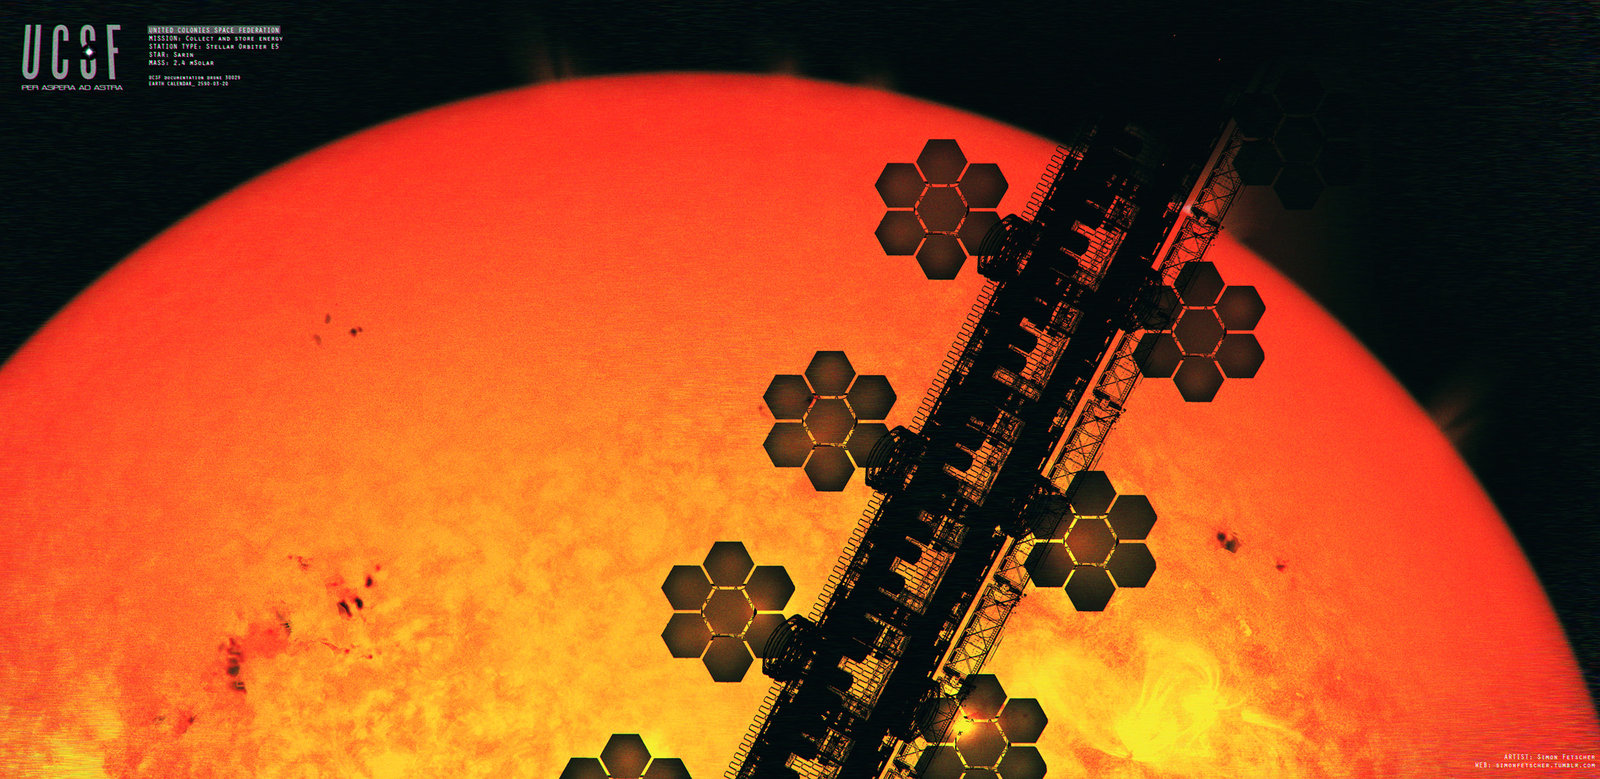 UCSF Stellar Orbiter